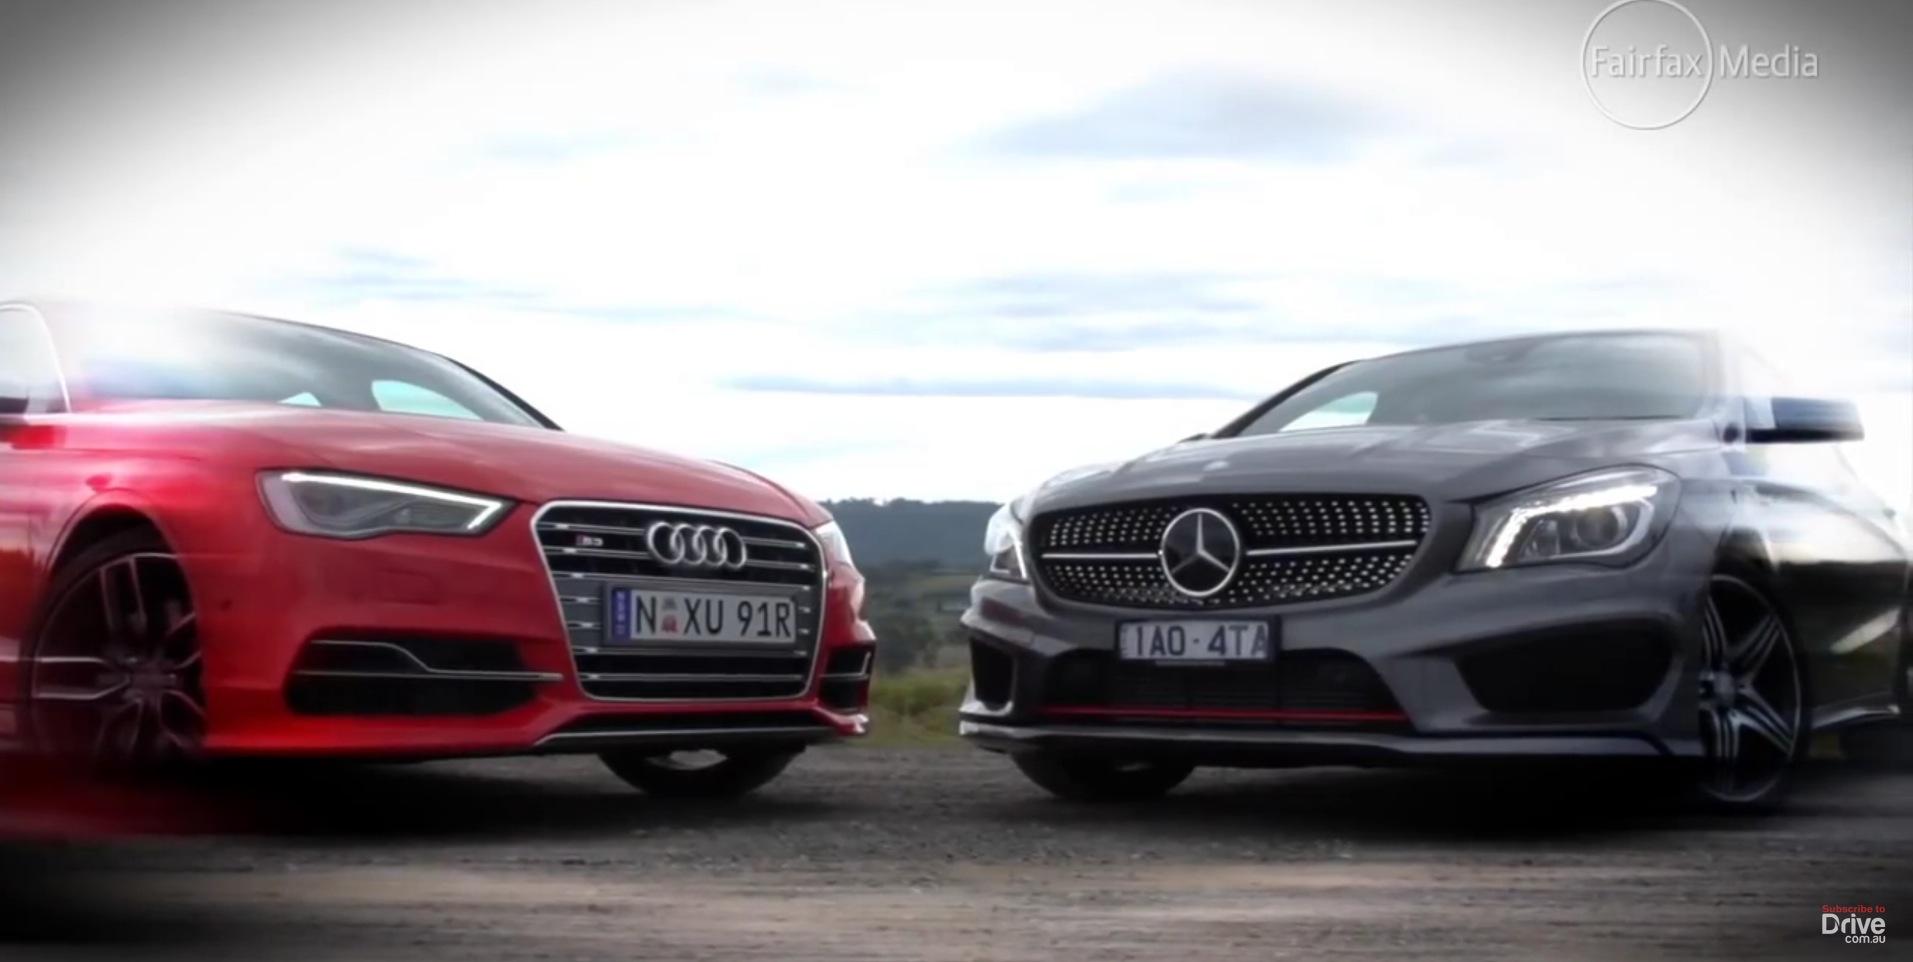 Kelebihan Audi Mercedes Top Model Tahun Ini